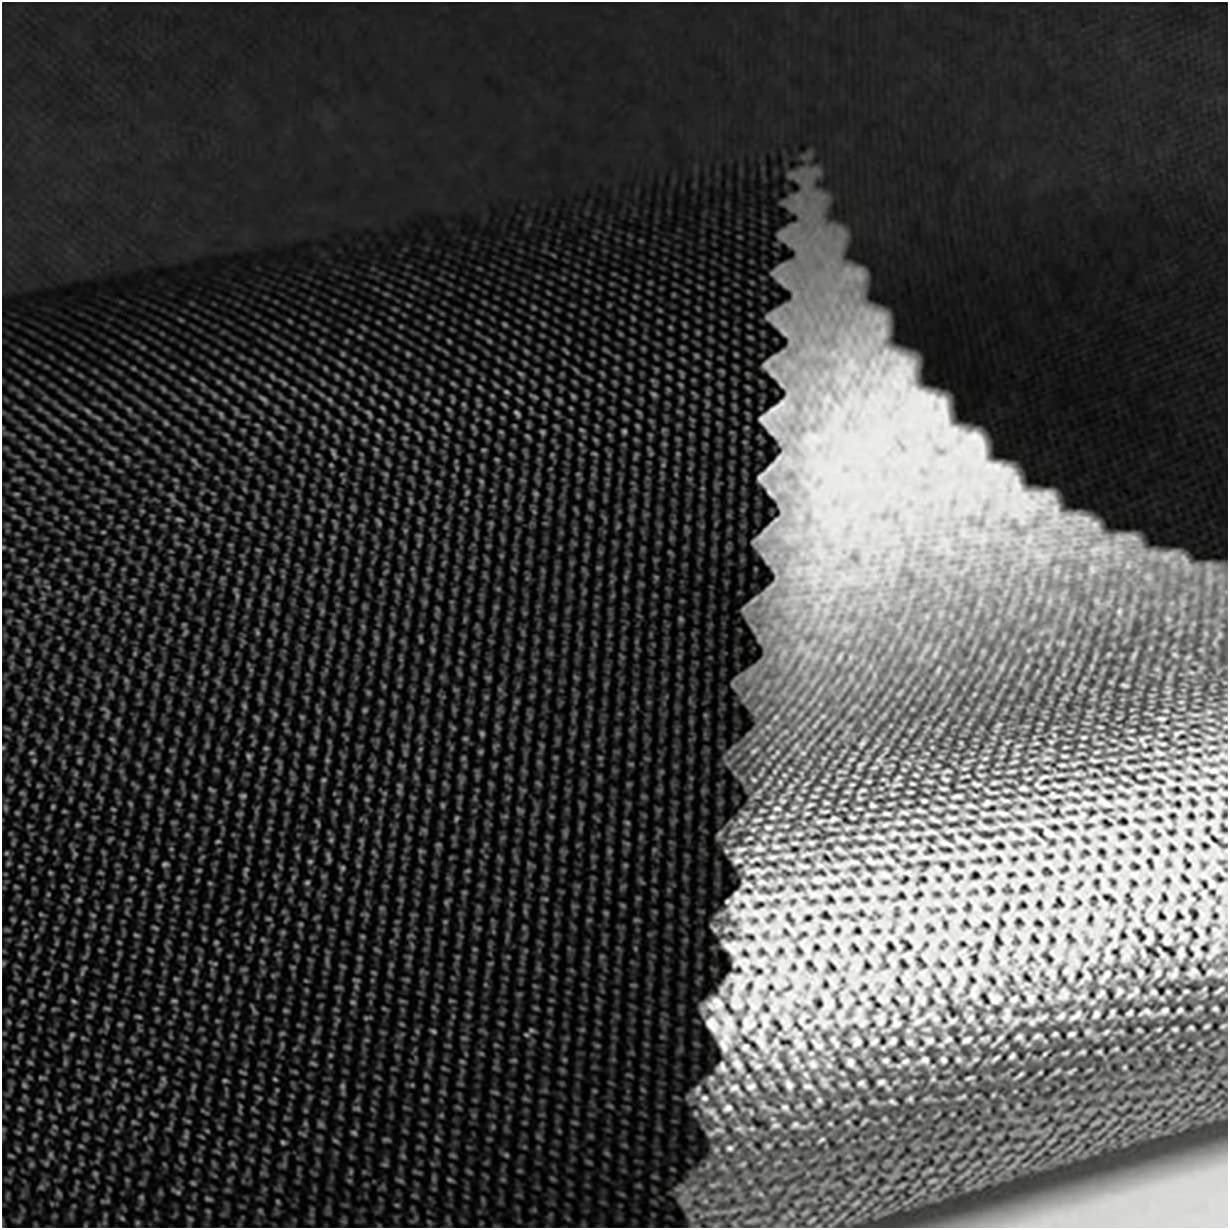 Luosfuh Tejido ignífugo 600D, Tela elástica de alambre, Tela impermeable recubierta de plata impermeable, Tela decorativa, Tela de equipaje Negro 1m